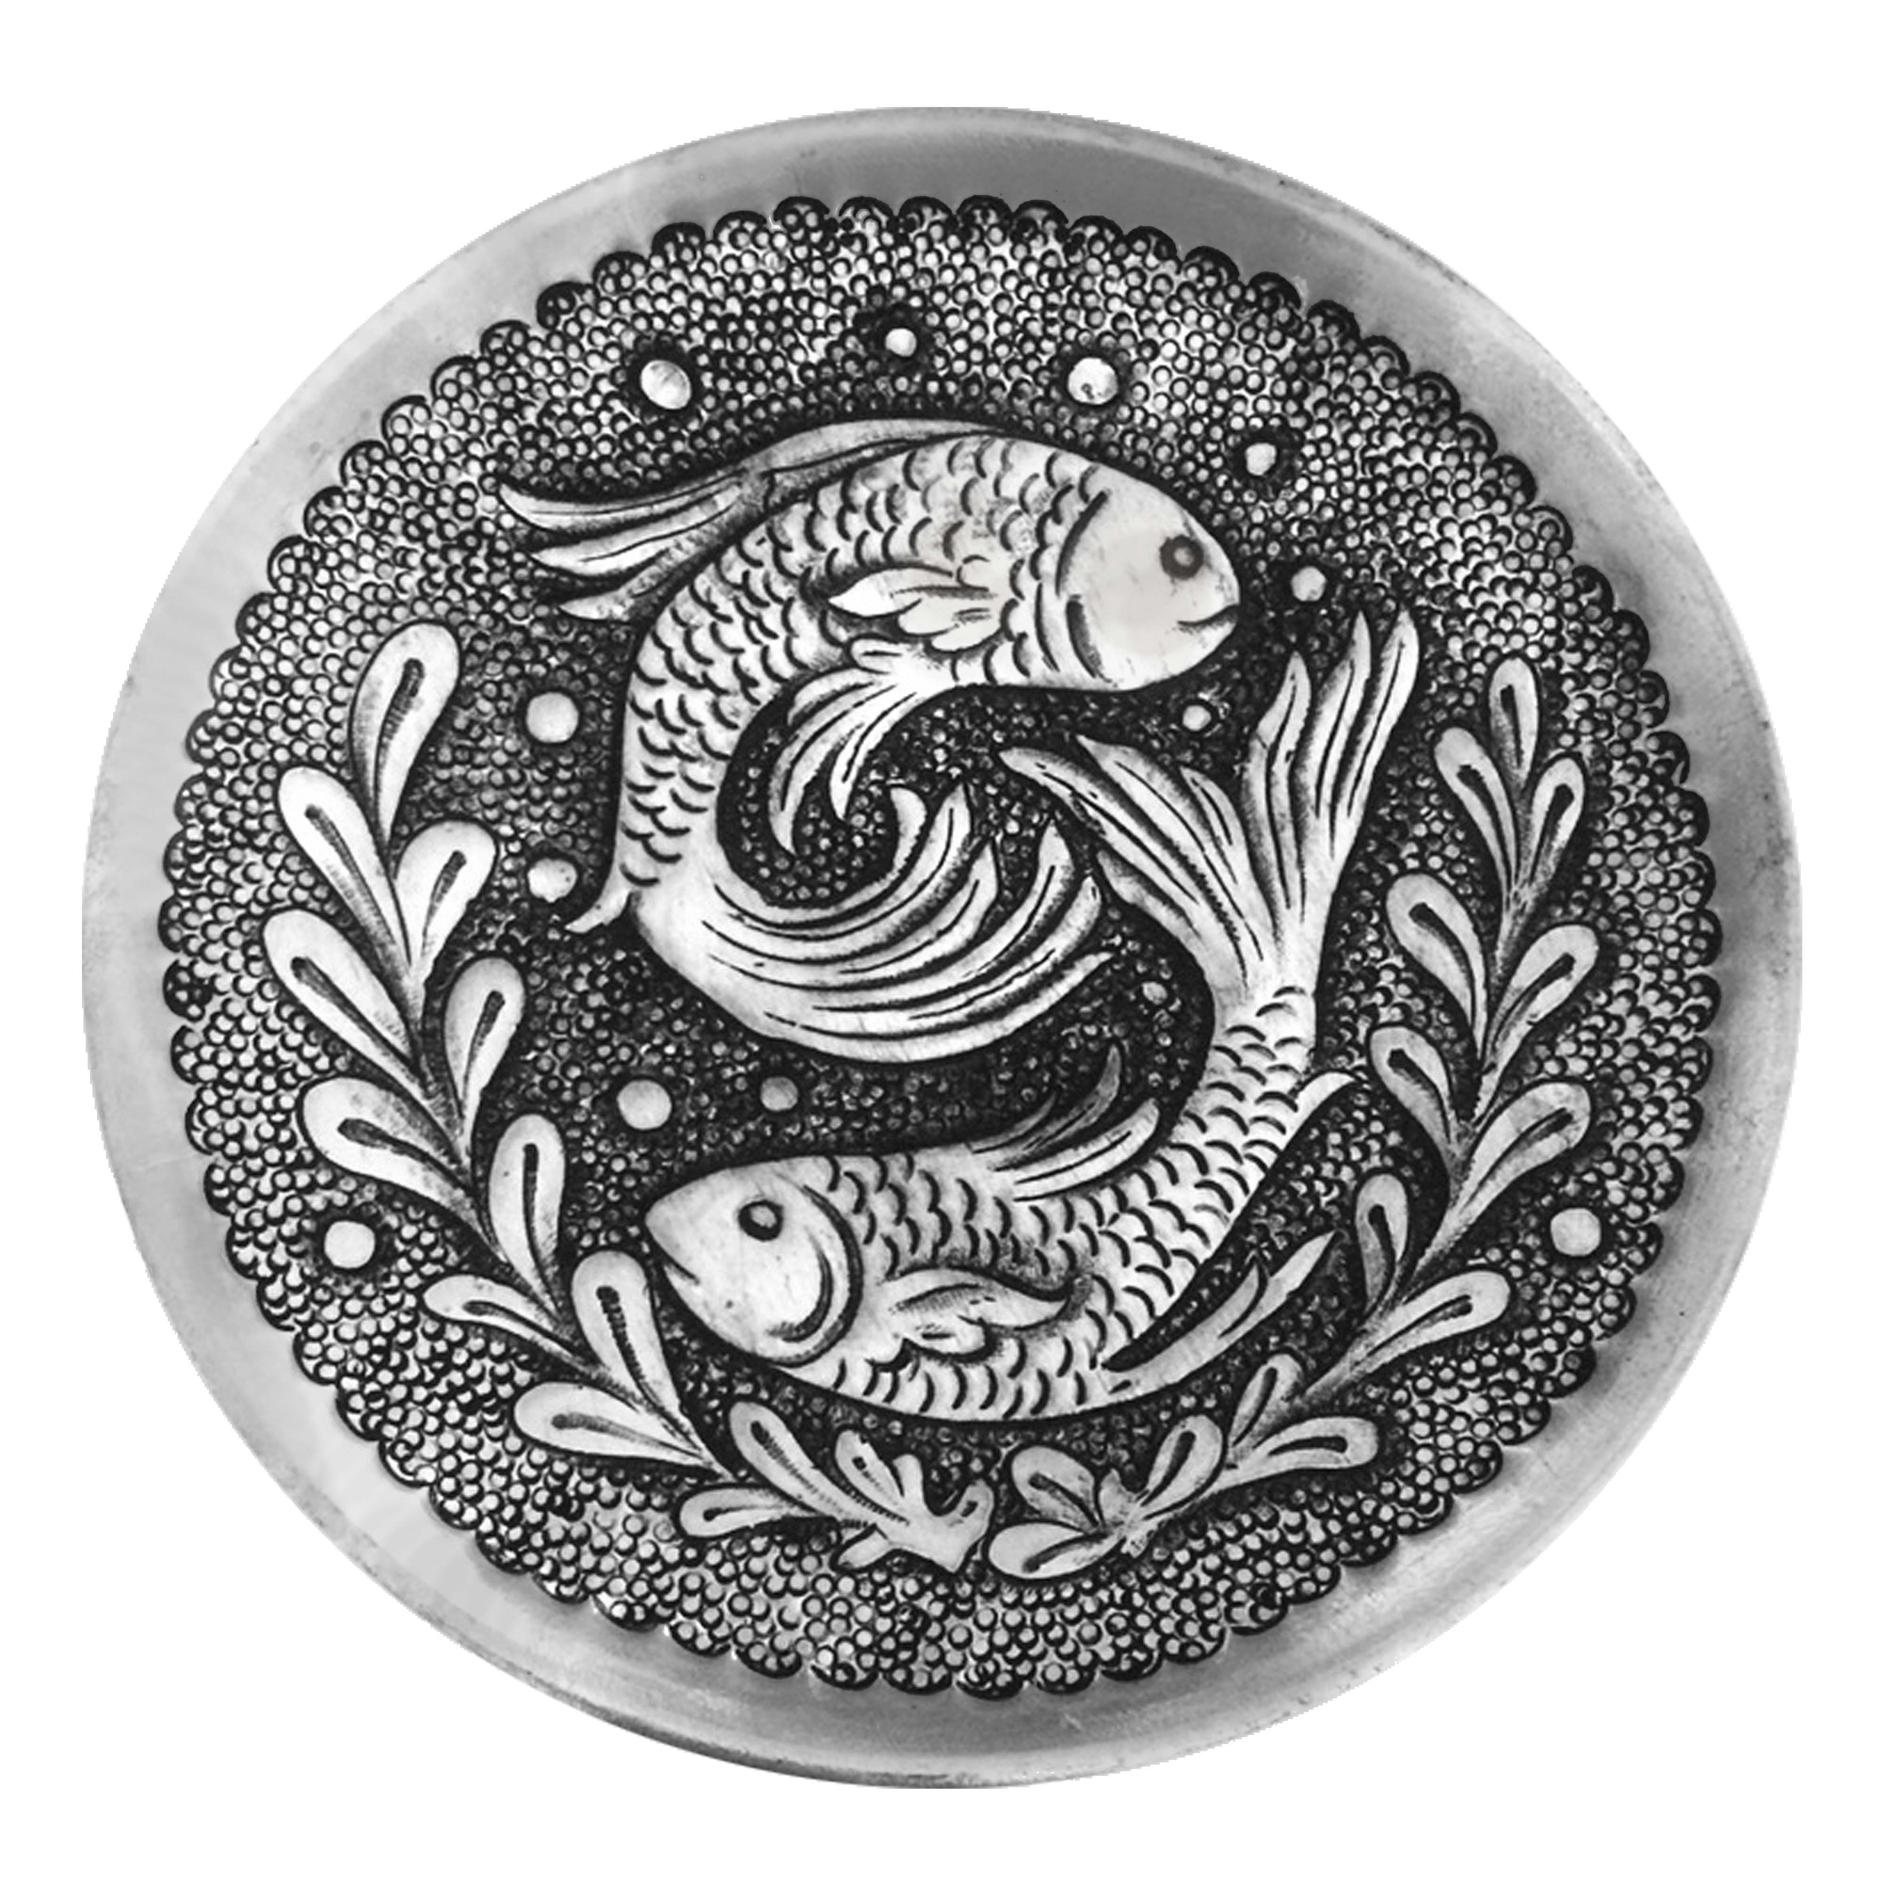 بشقاب قلمزنی طرح ماهی کد 111